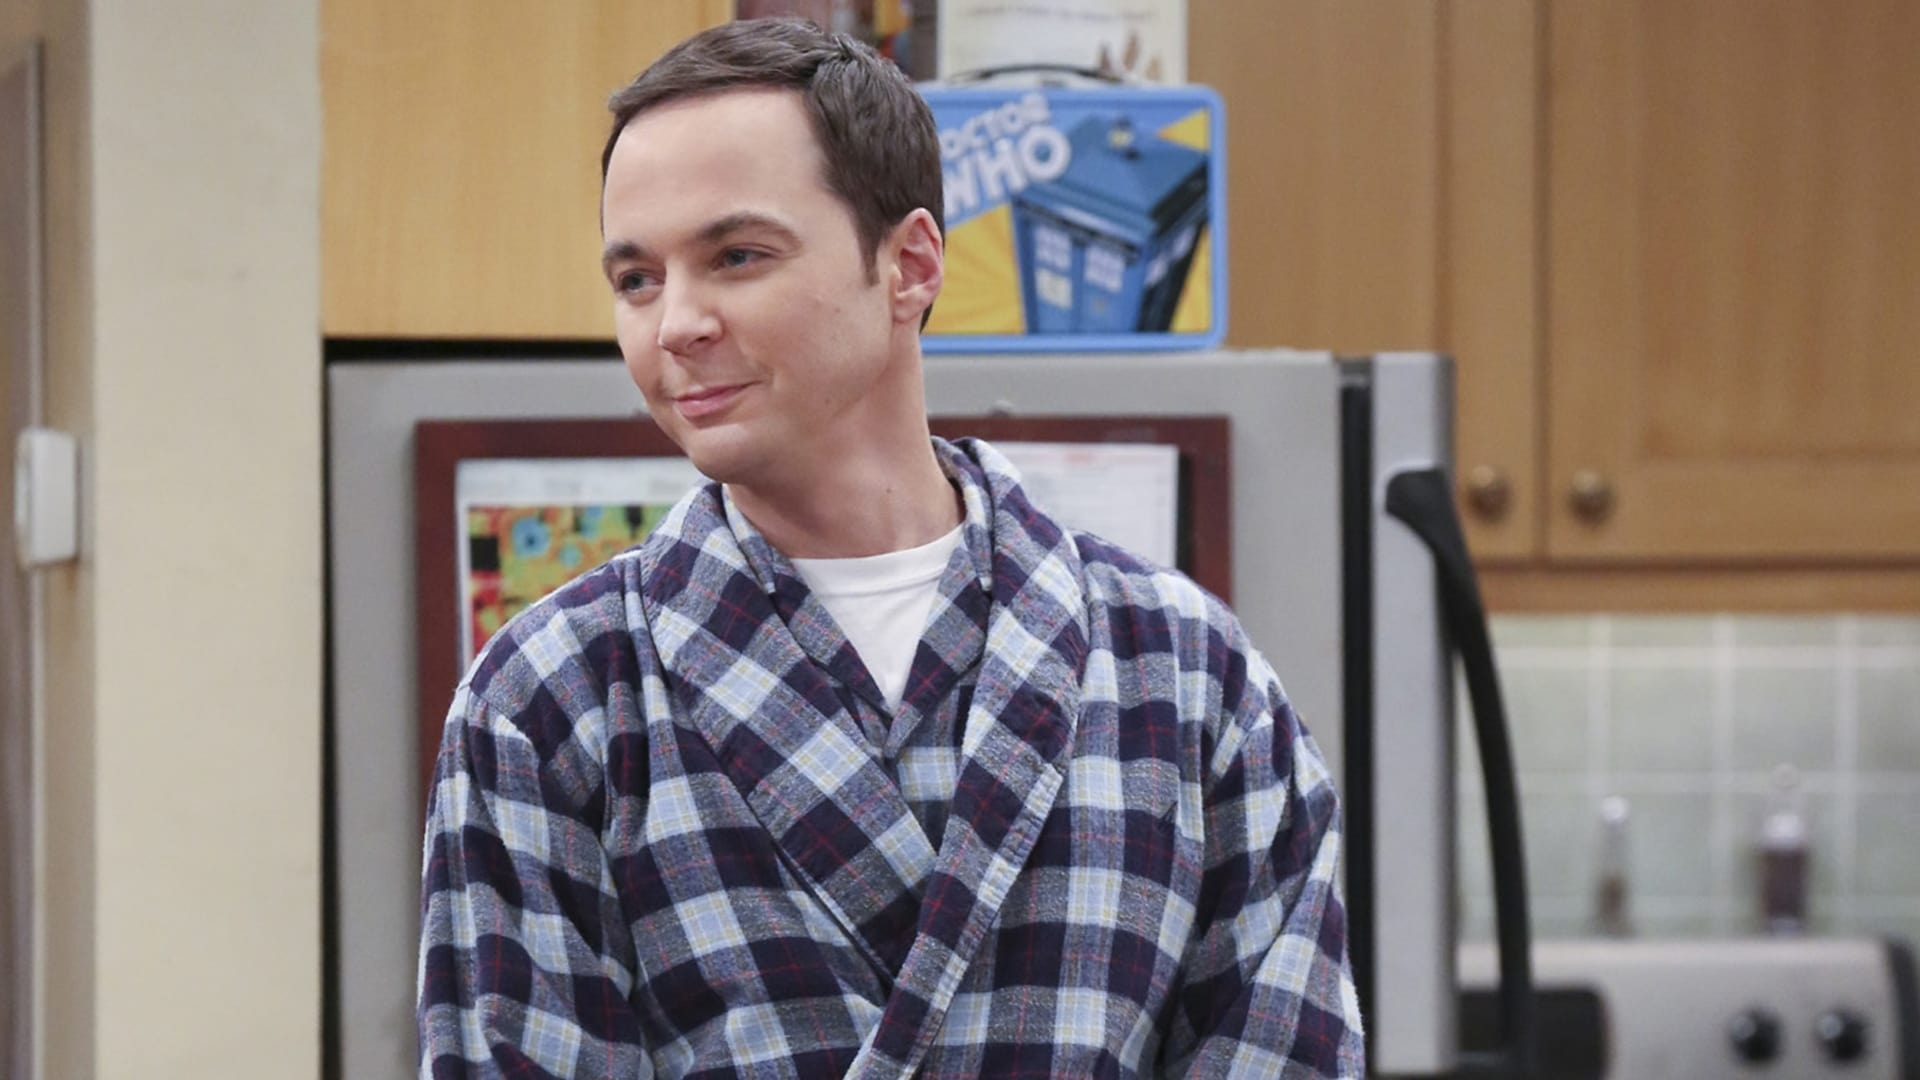 The Big Bang Theory - Season 9 Episode 13 : The Empathy Optimization